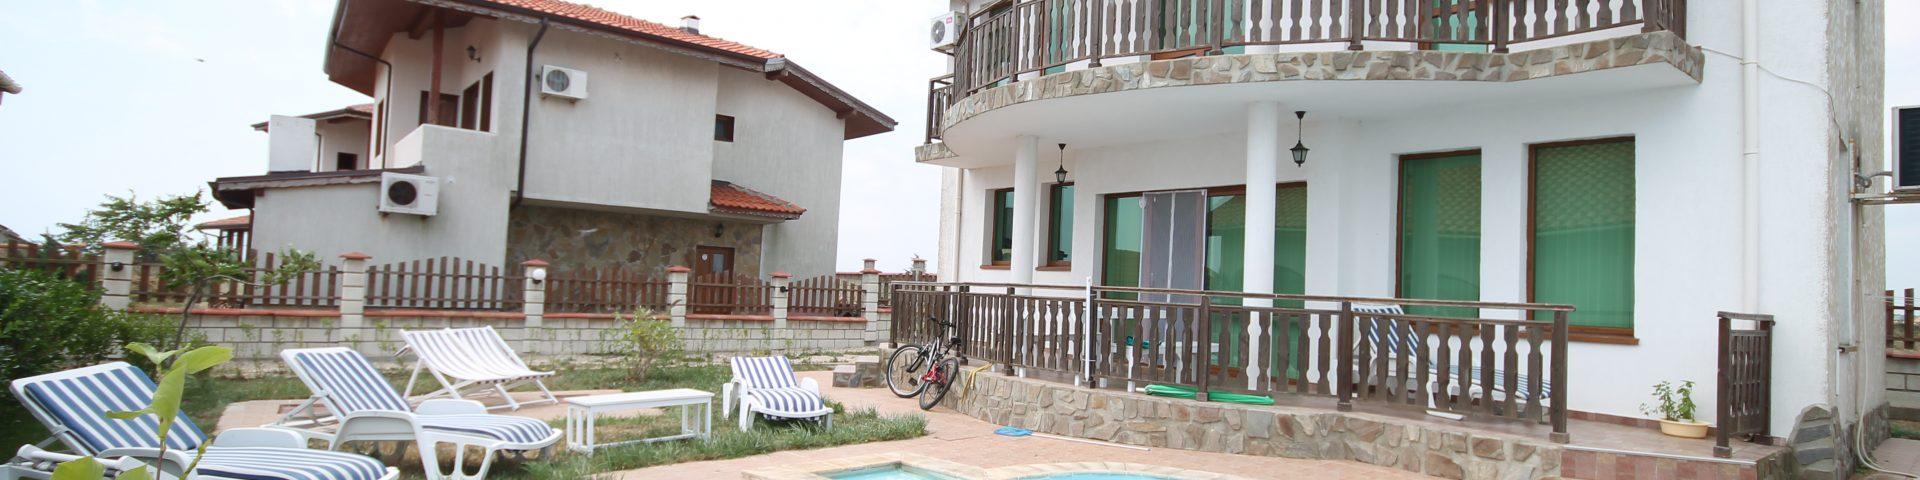 Домик в Болгарии_New Estate Bulgaria